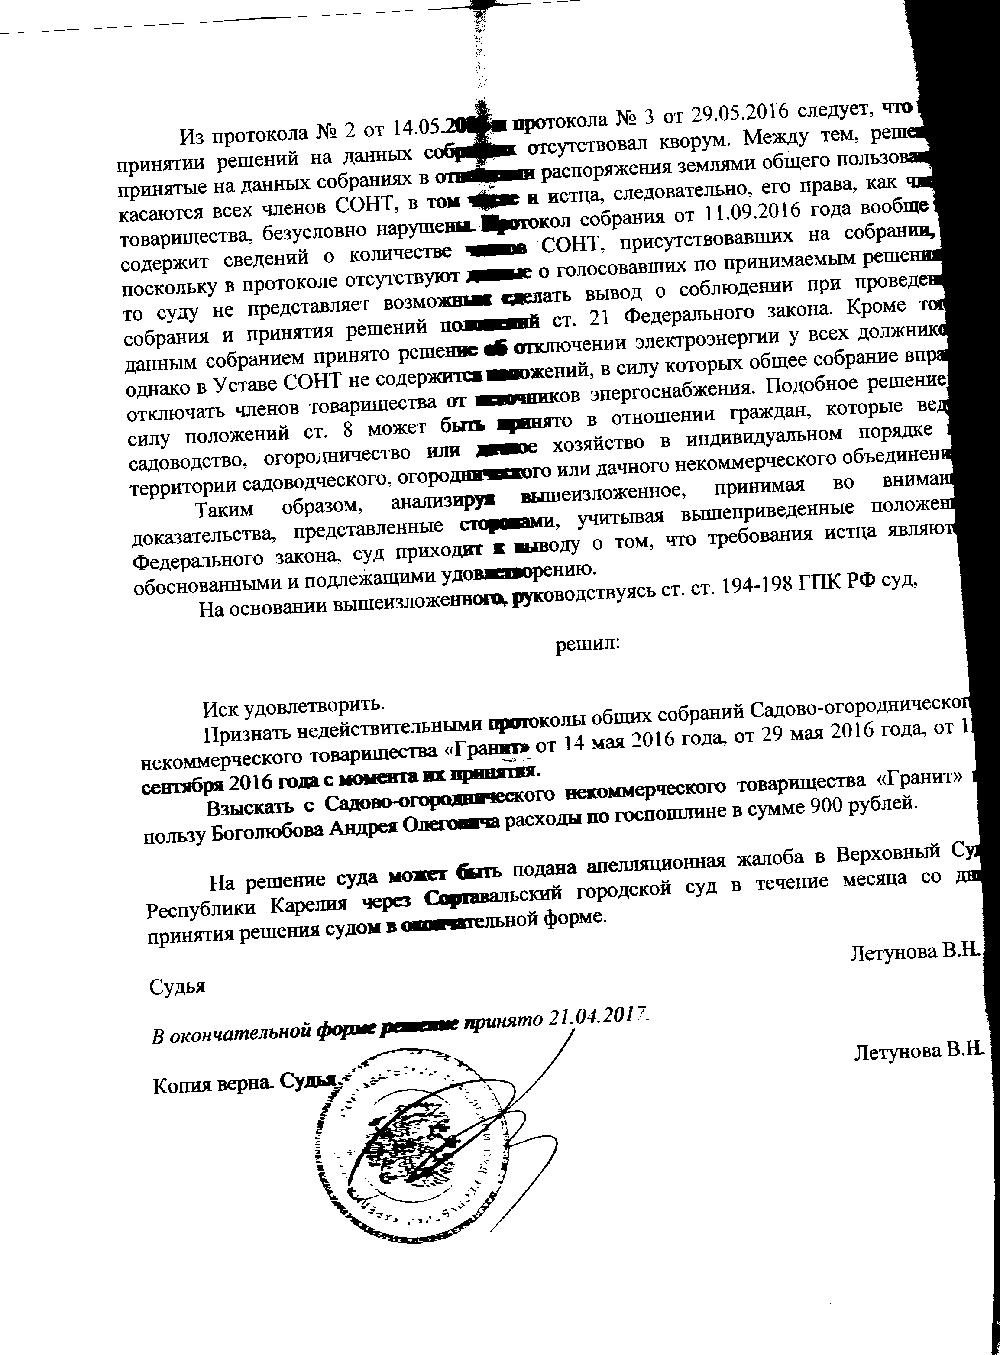 https://sontgranit.ru/forum/img/sokol/решение5.png